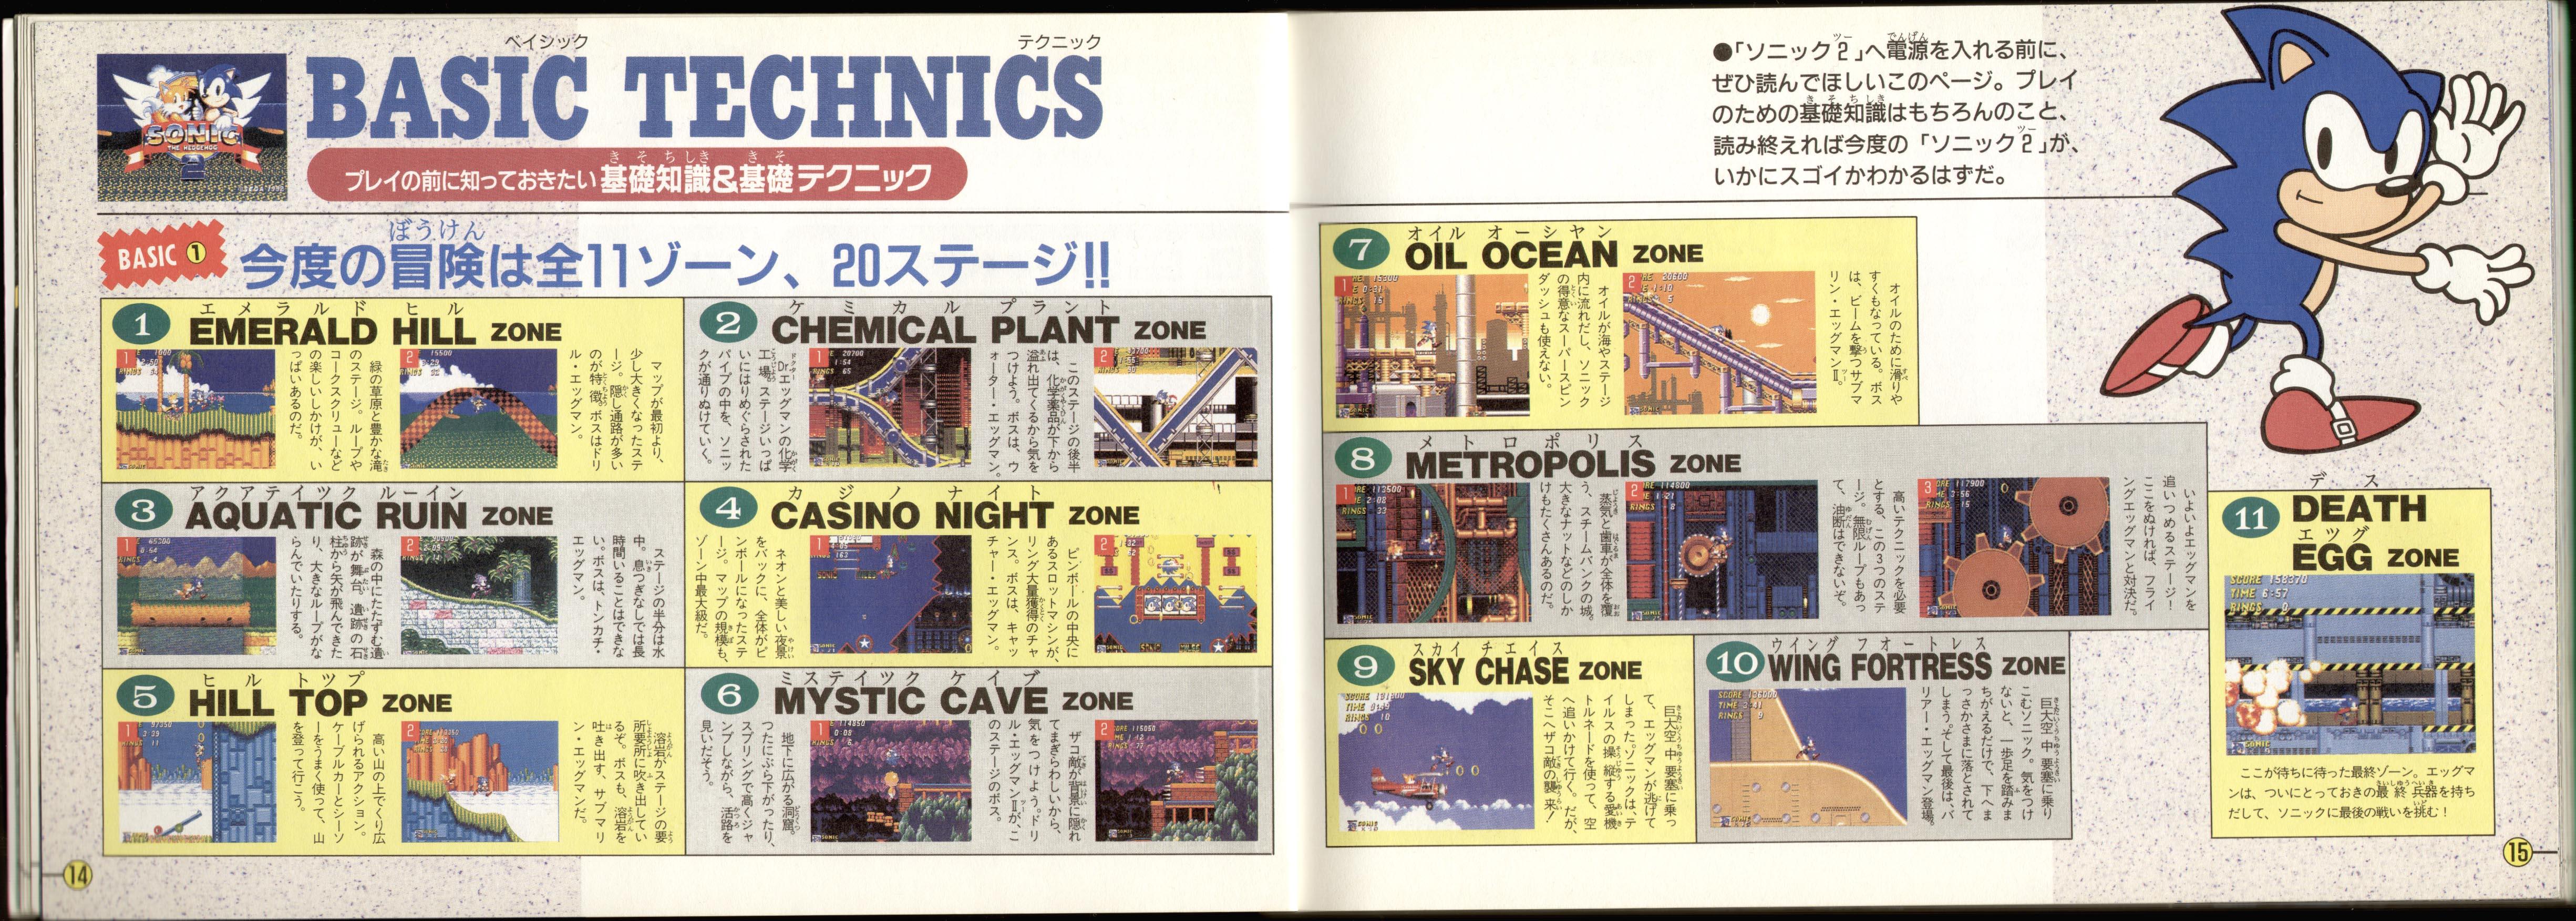 Sonic 2 Manual Art - Pg 12